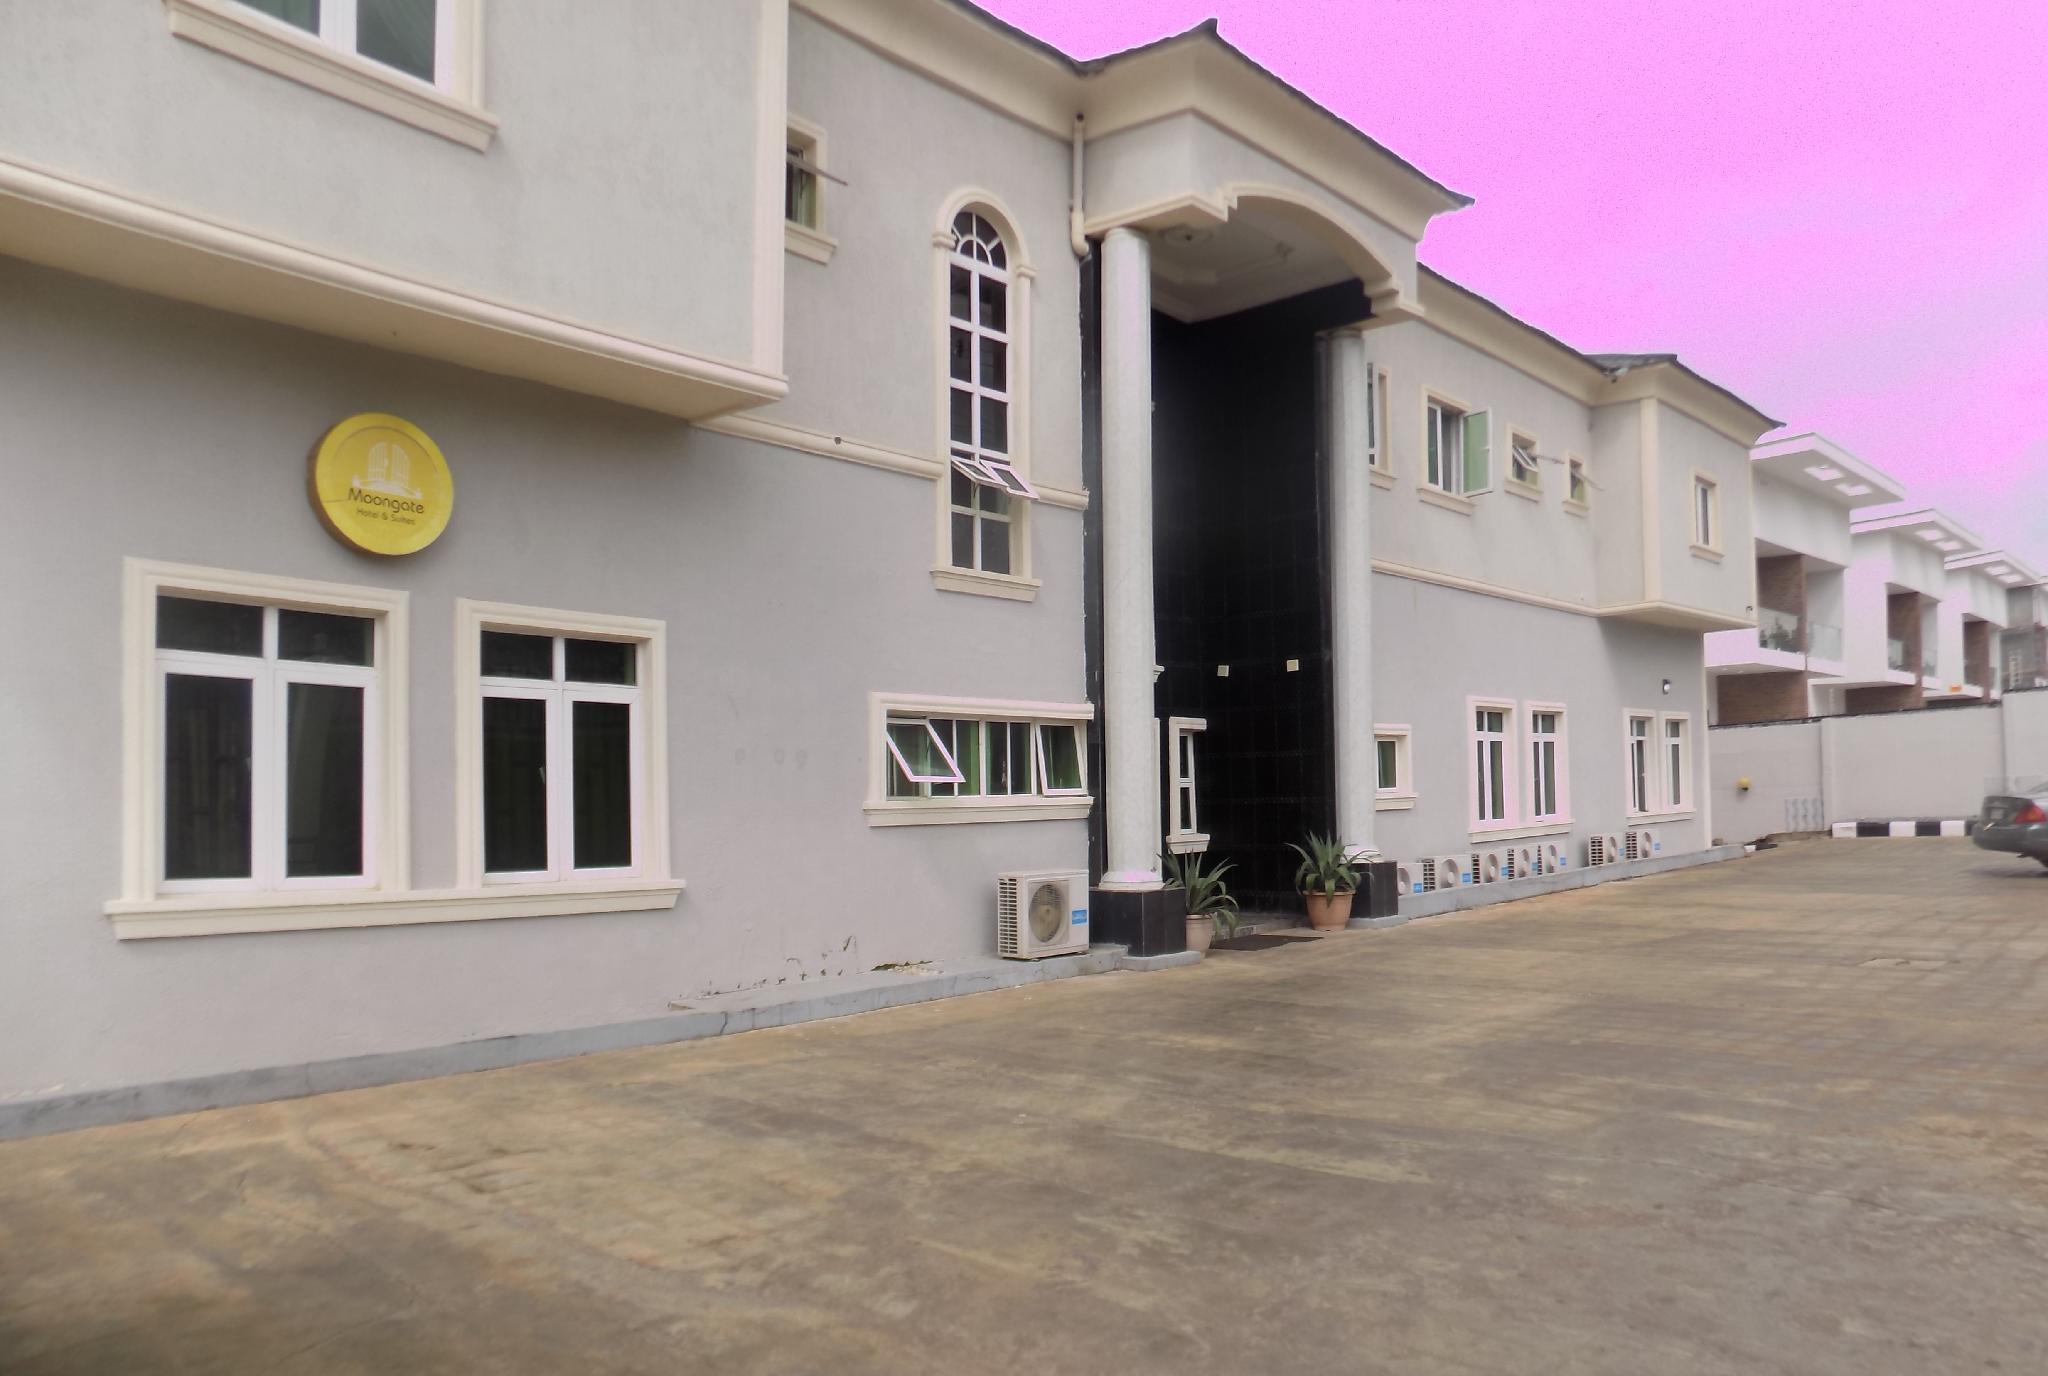 Moongate Hotel and Suites, Ibara, Obafemi-Owode